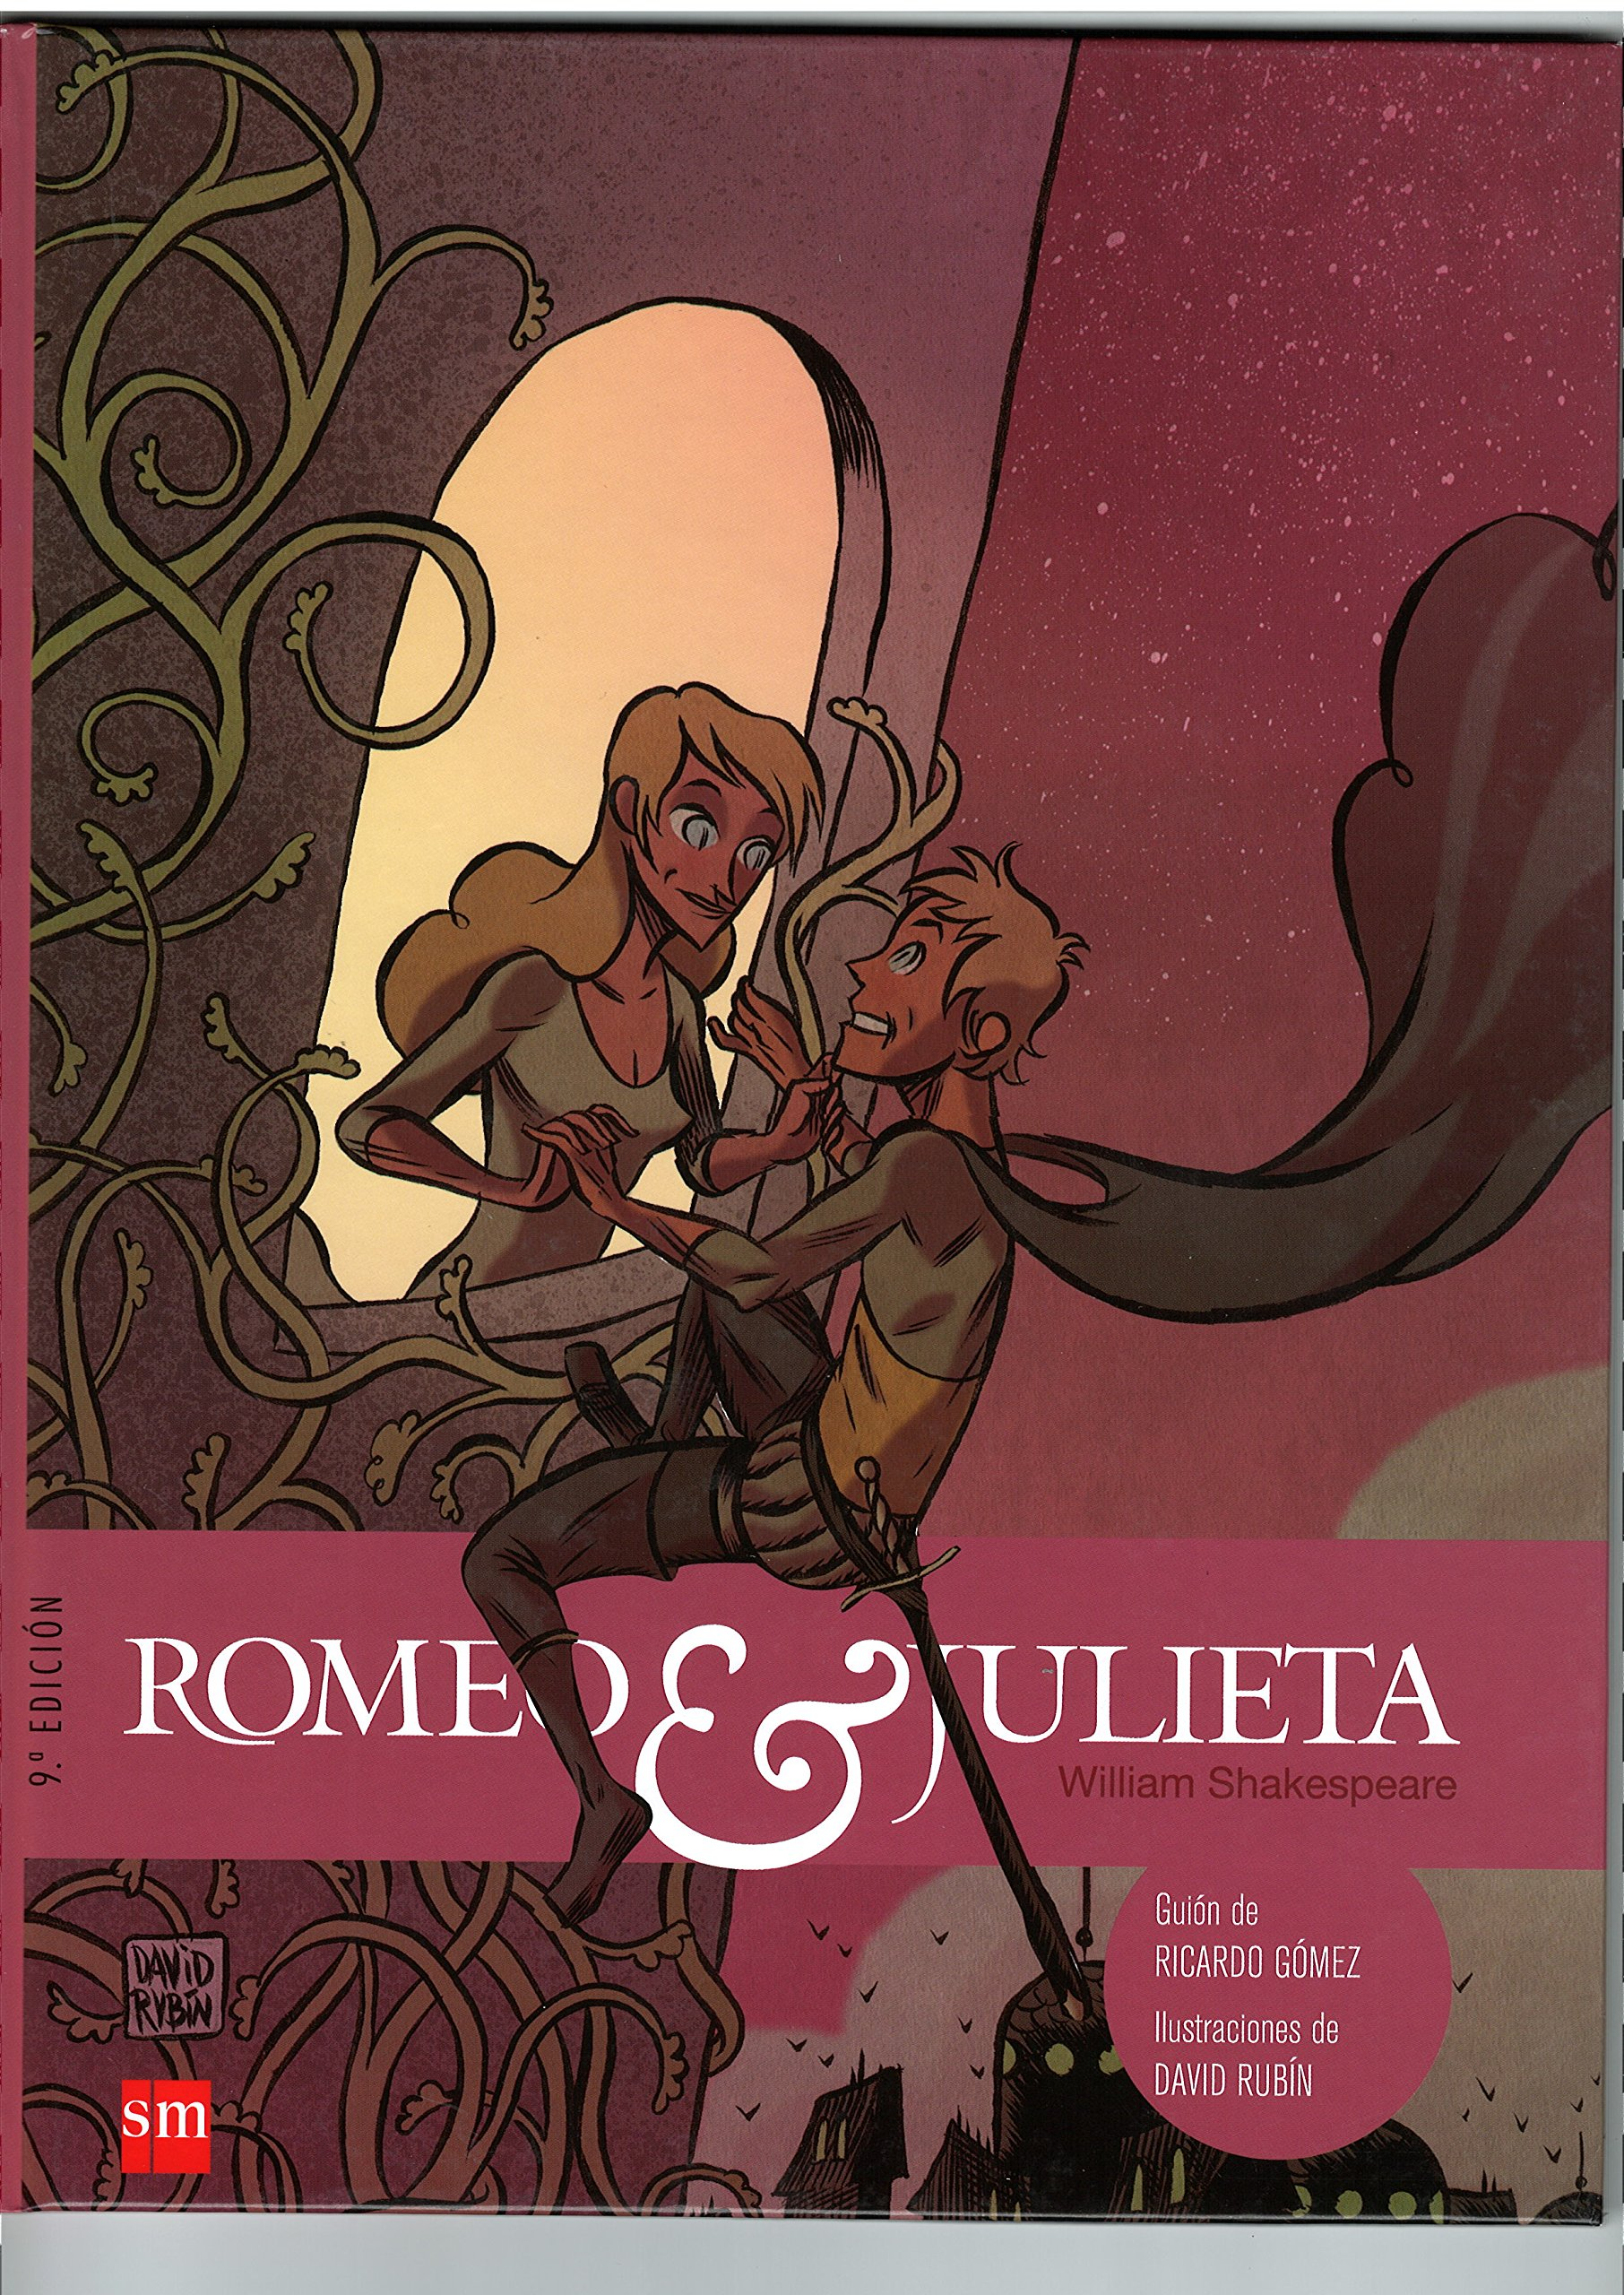 Romeo & Julieta (Clasicos en cómic)